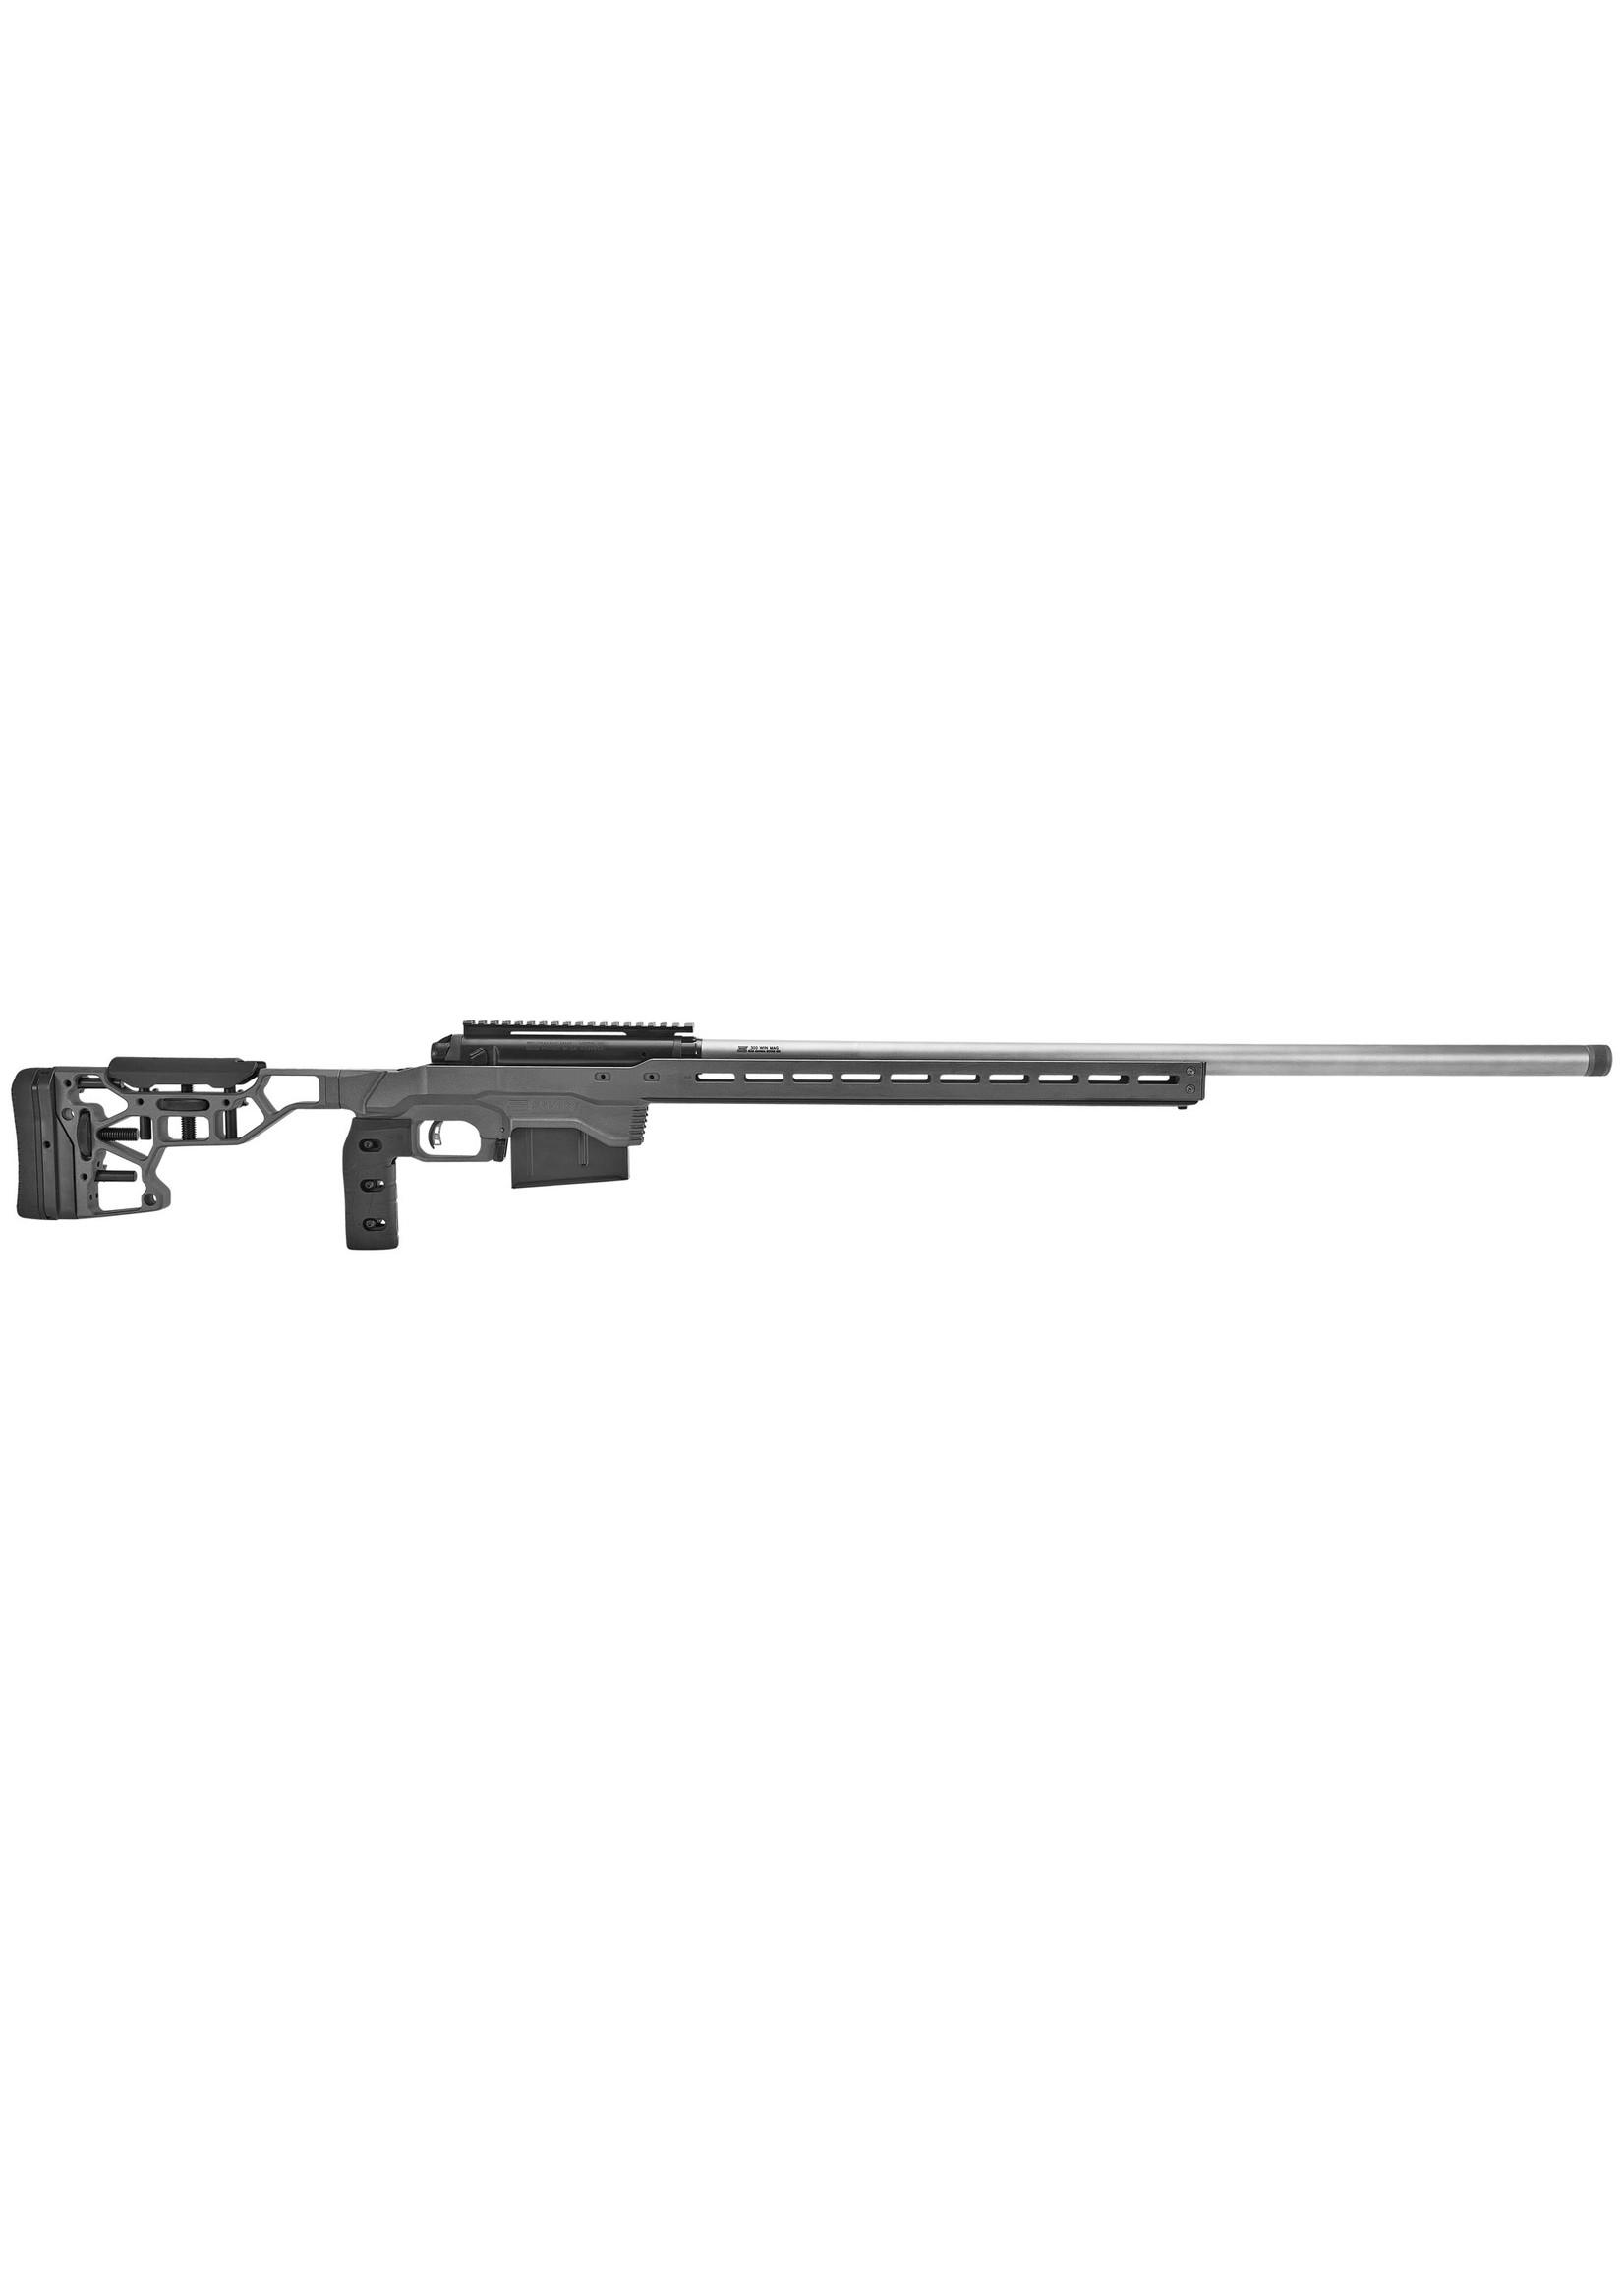 Savage Savage Arms 110 ELITE PRECISION 6.5CR LH 57703 | ARCA RAIL CHASSIS 6.5 Creedmoor